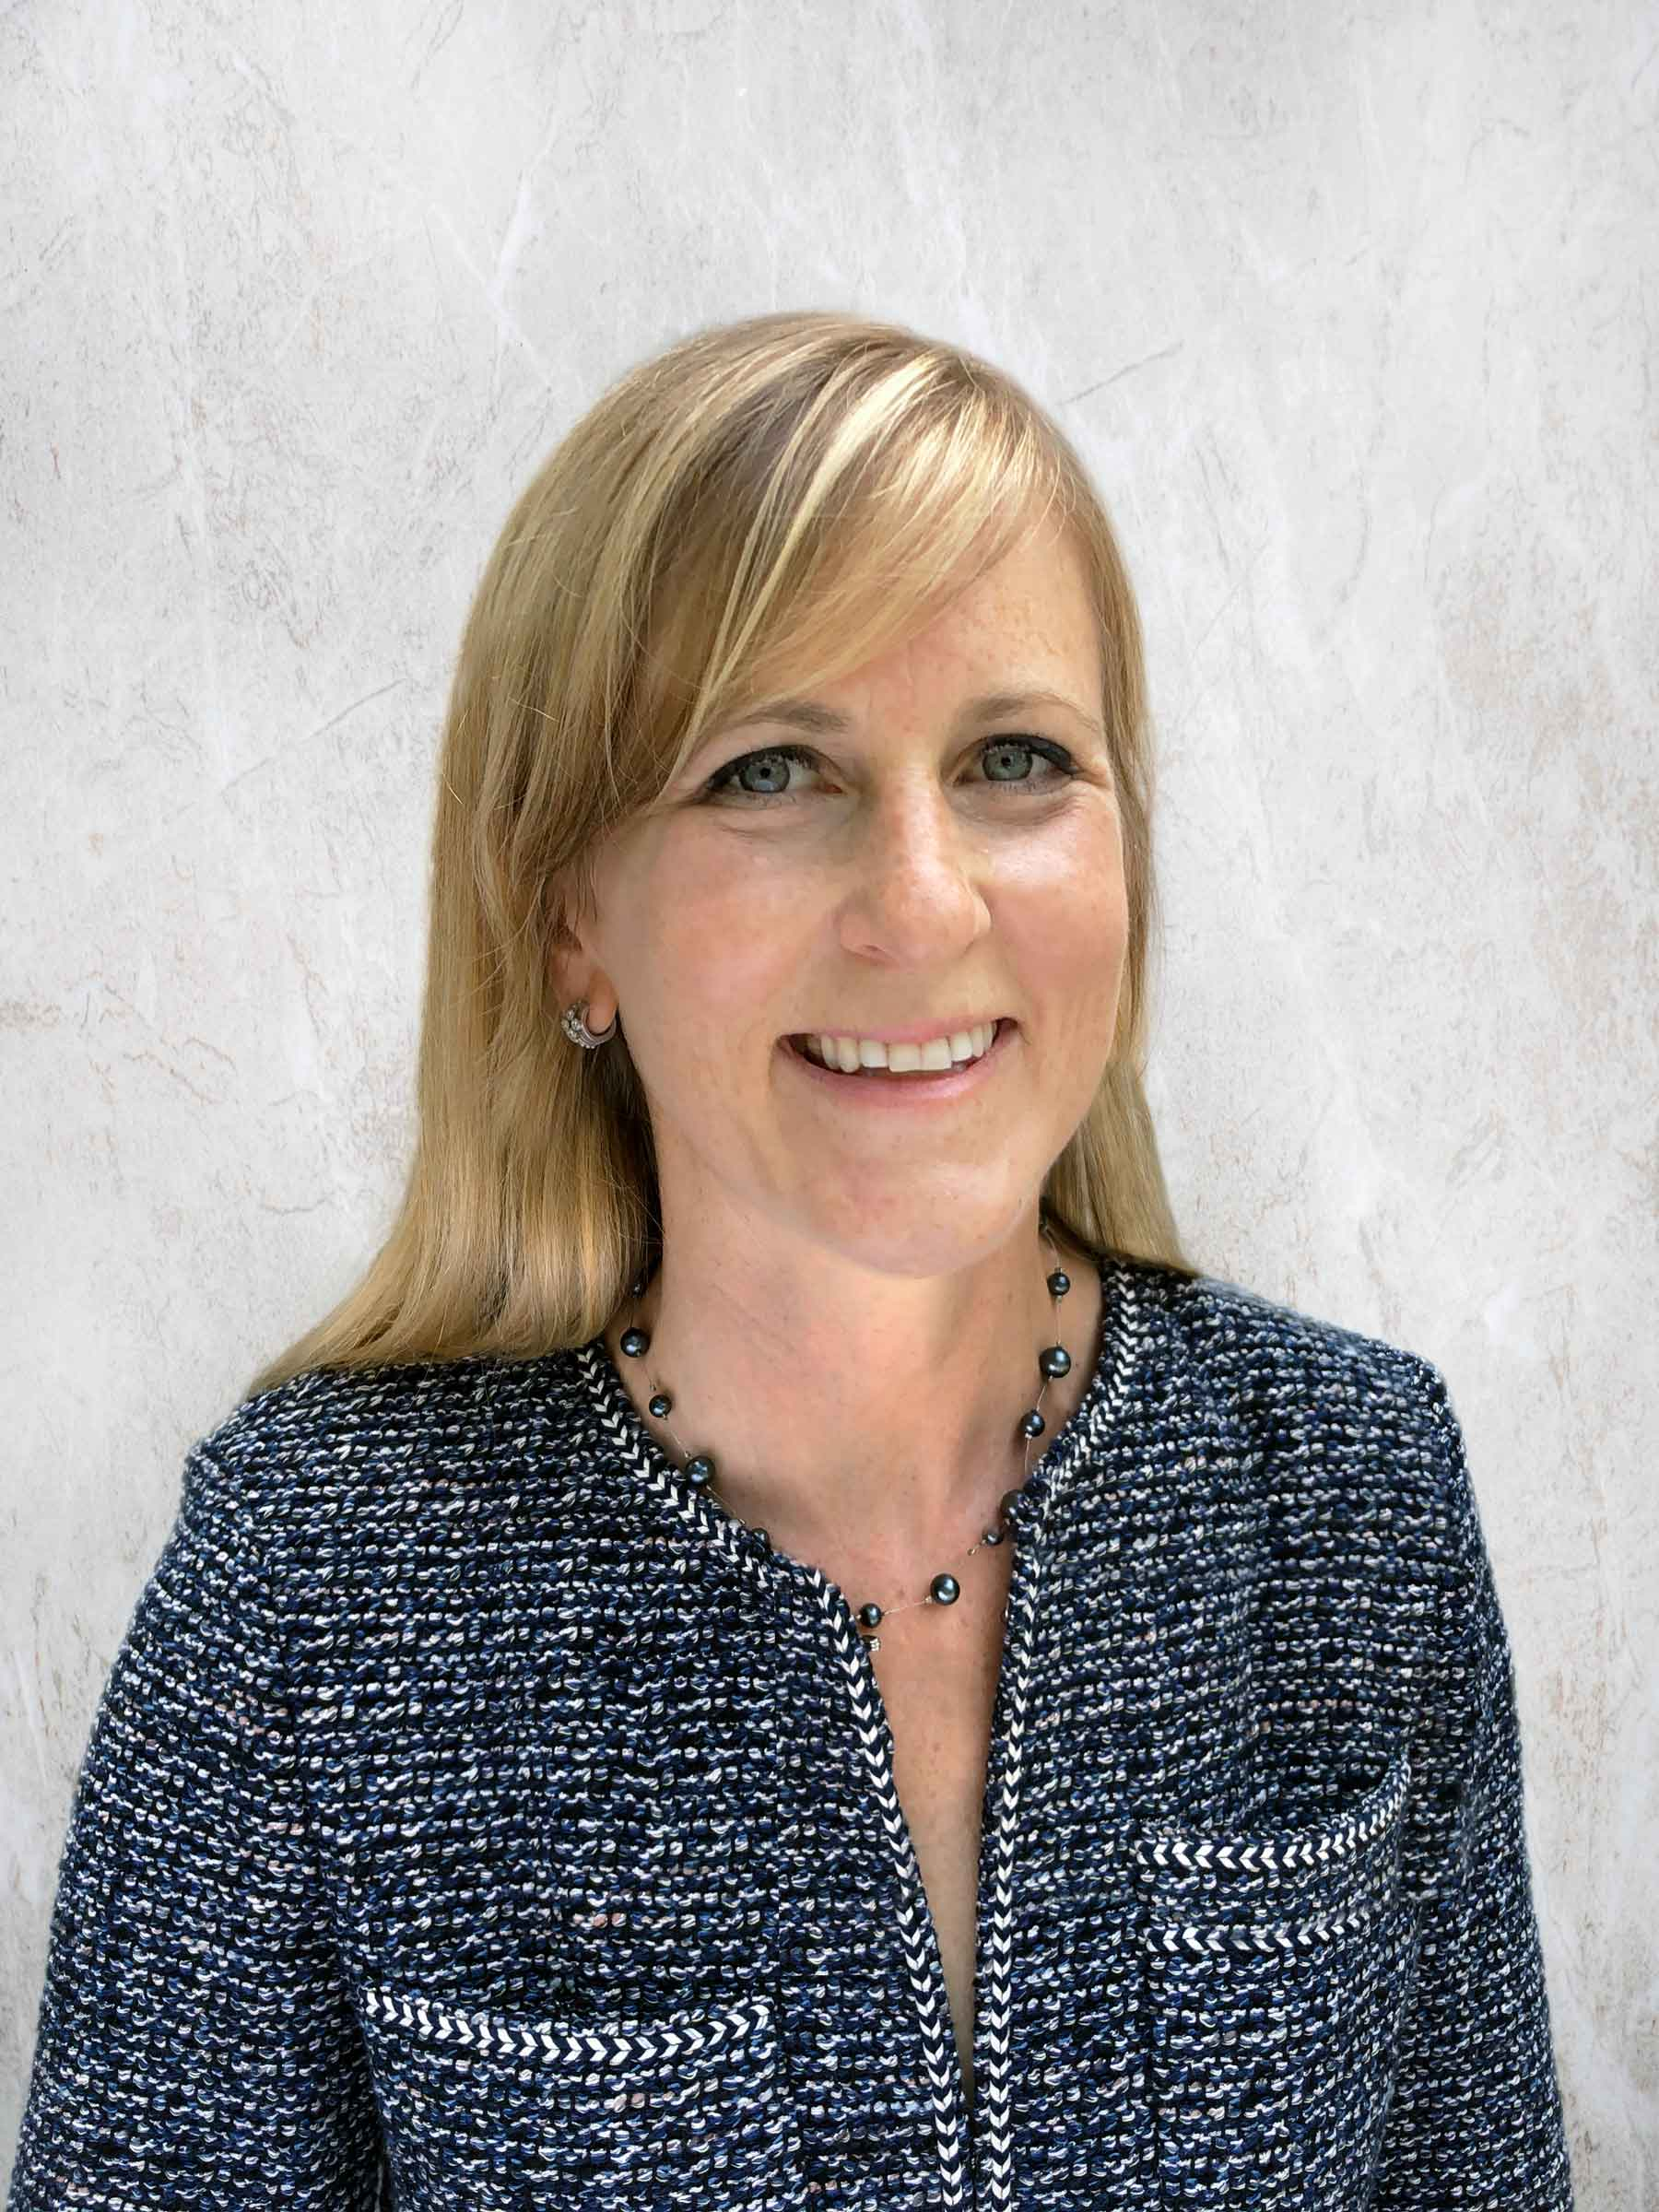 Lauren Kosseff, Partner | Aljijaki, Kosseff & Prendergast, LLC